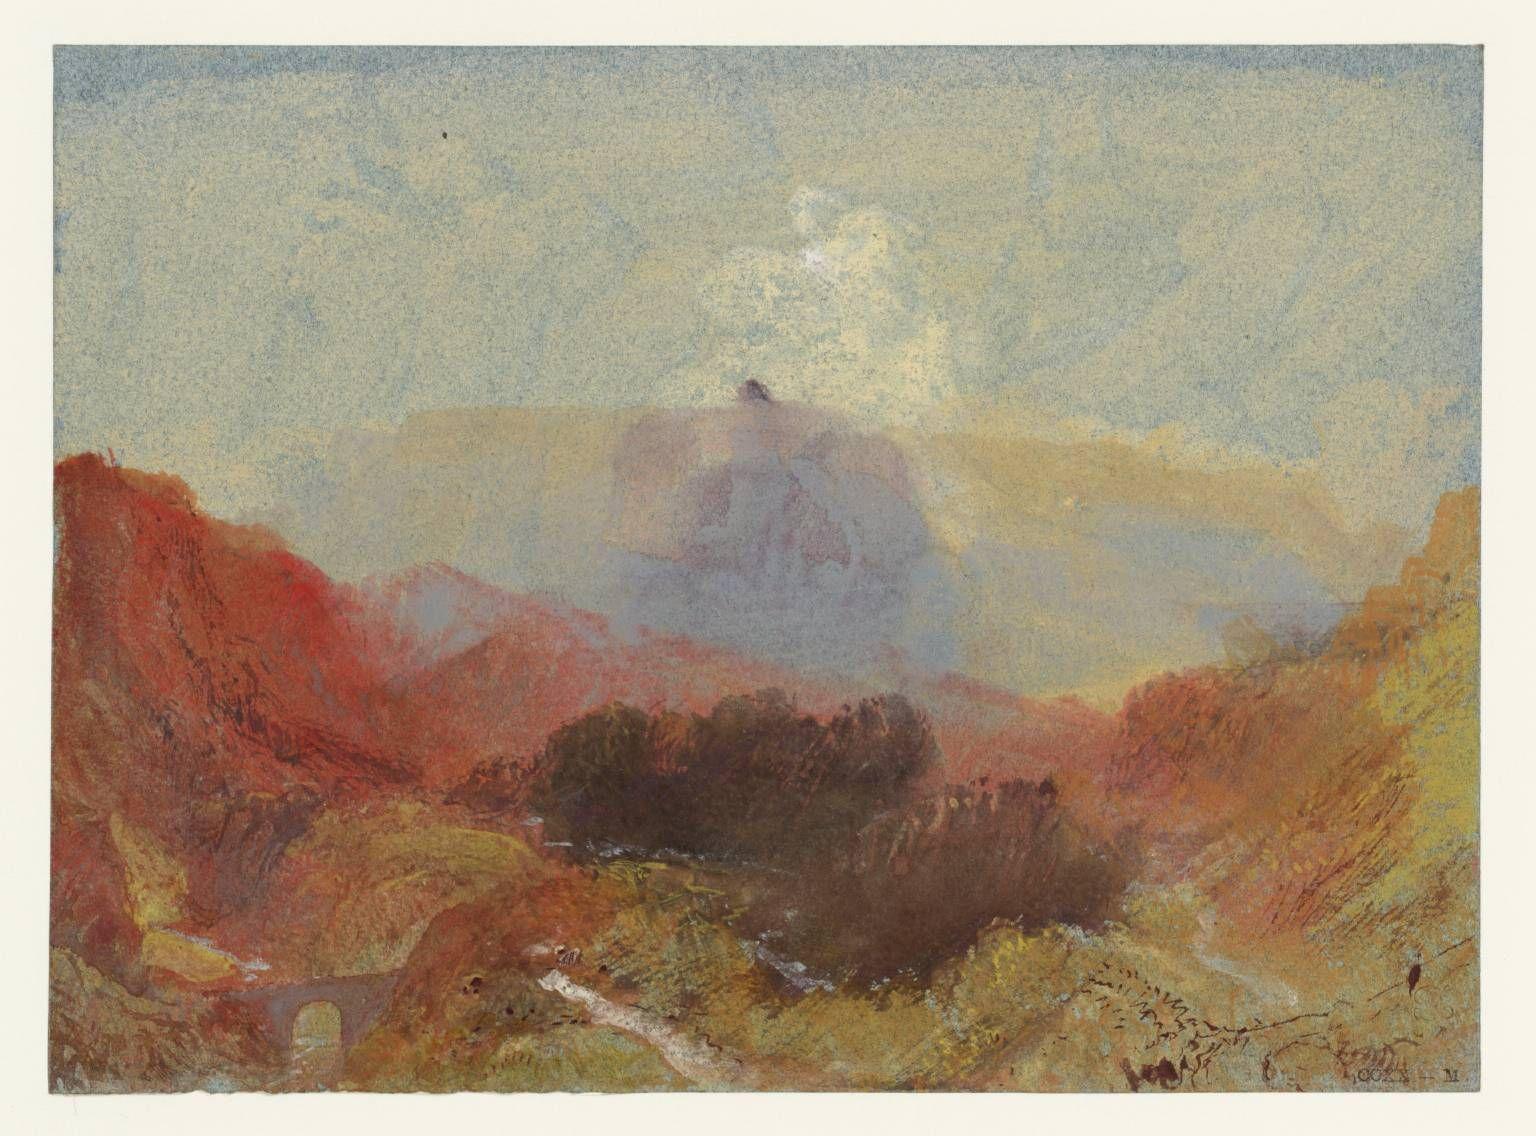 Luxembourg 1839 40 Joseph Mallord William Turner